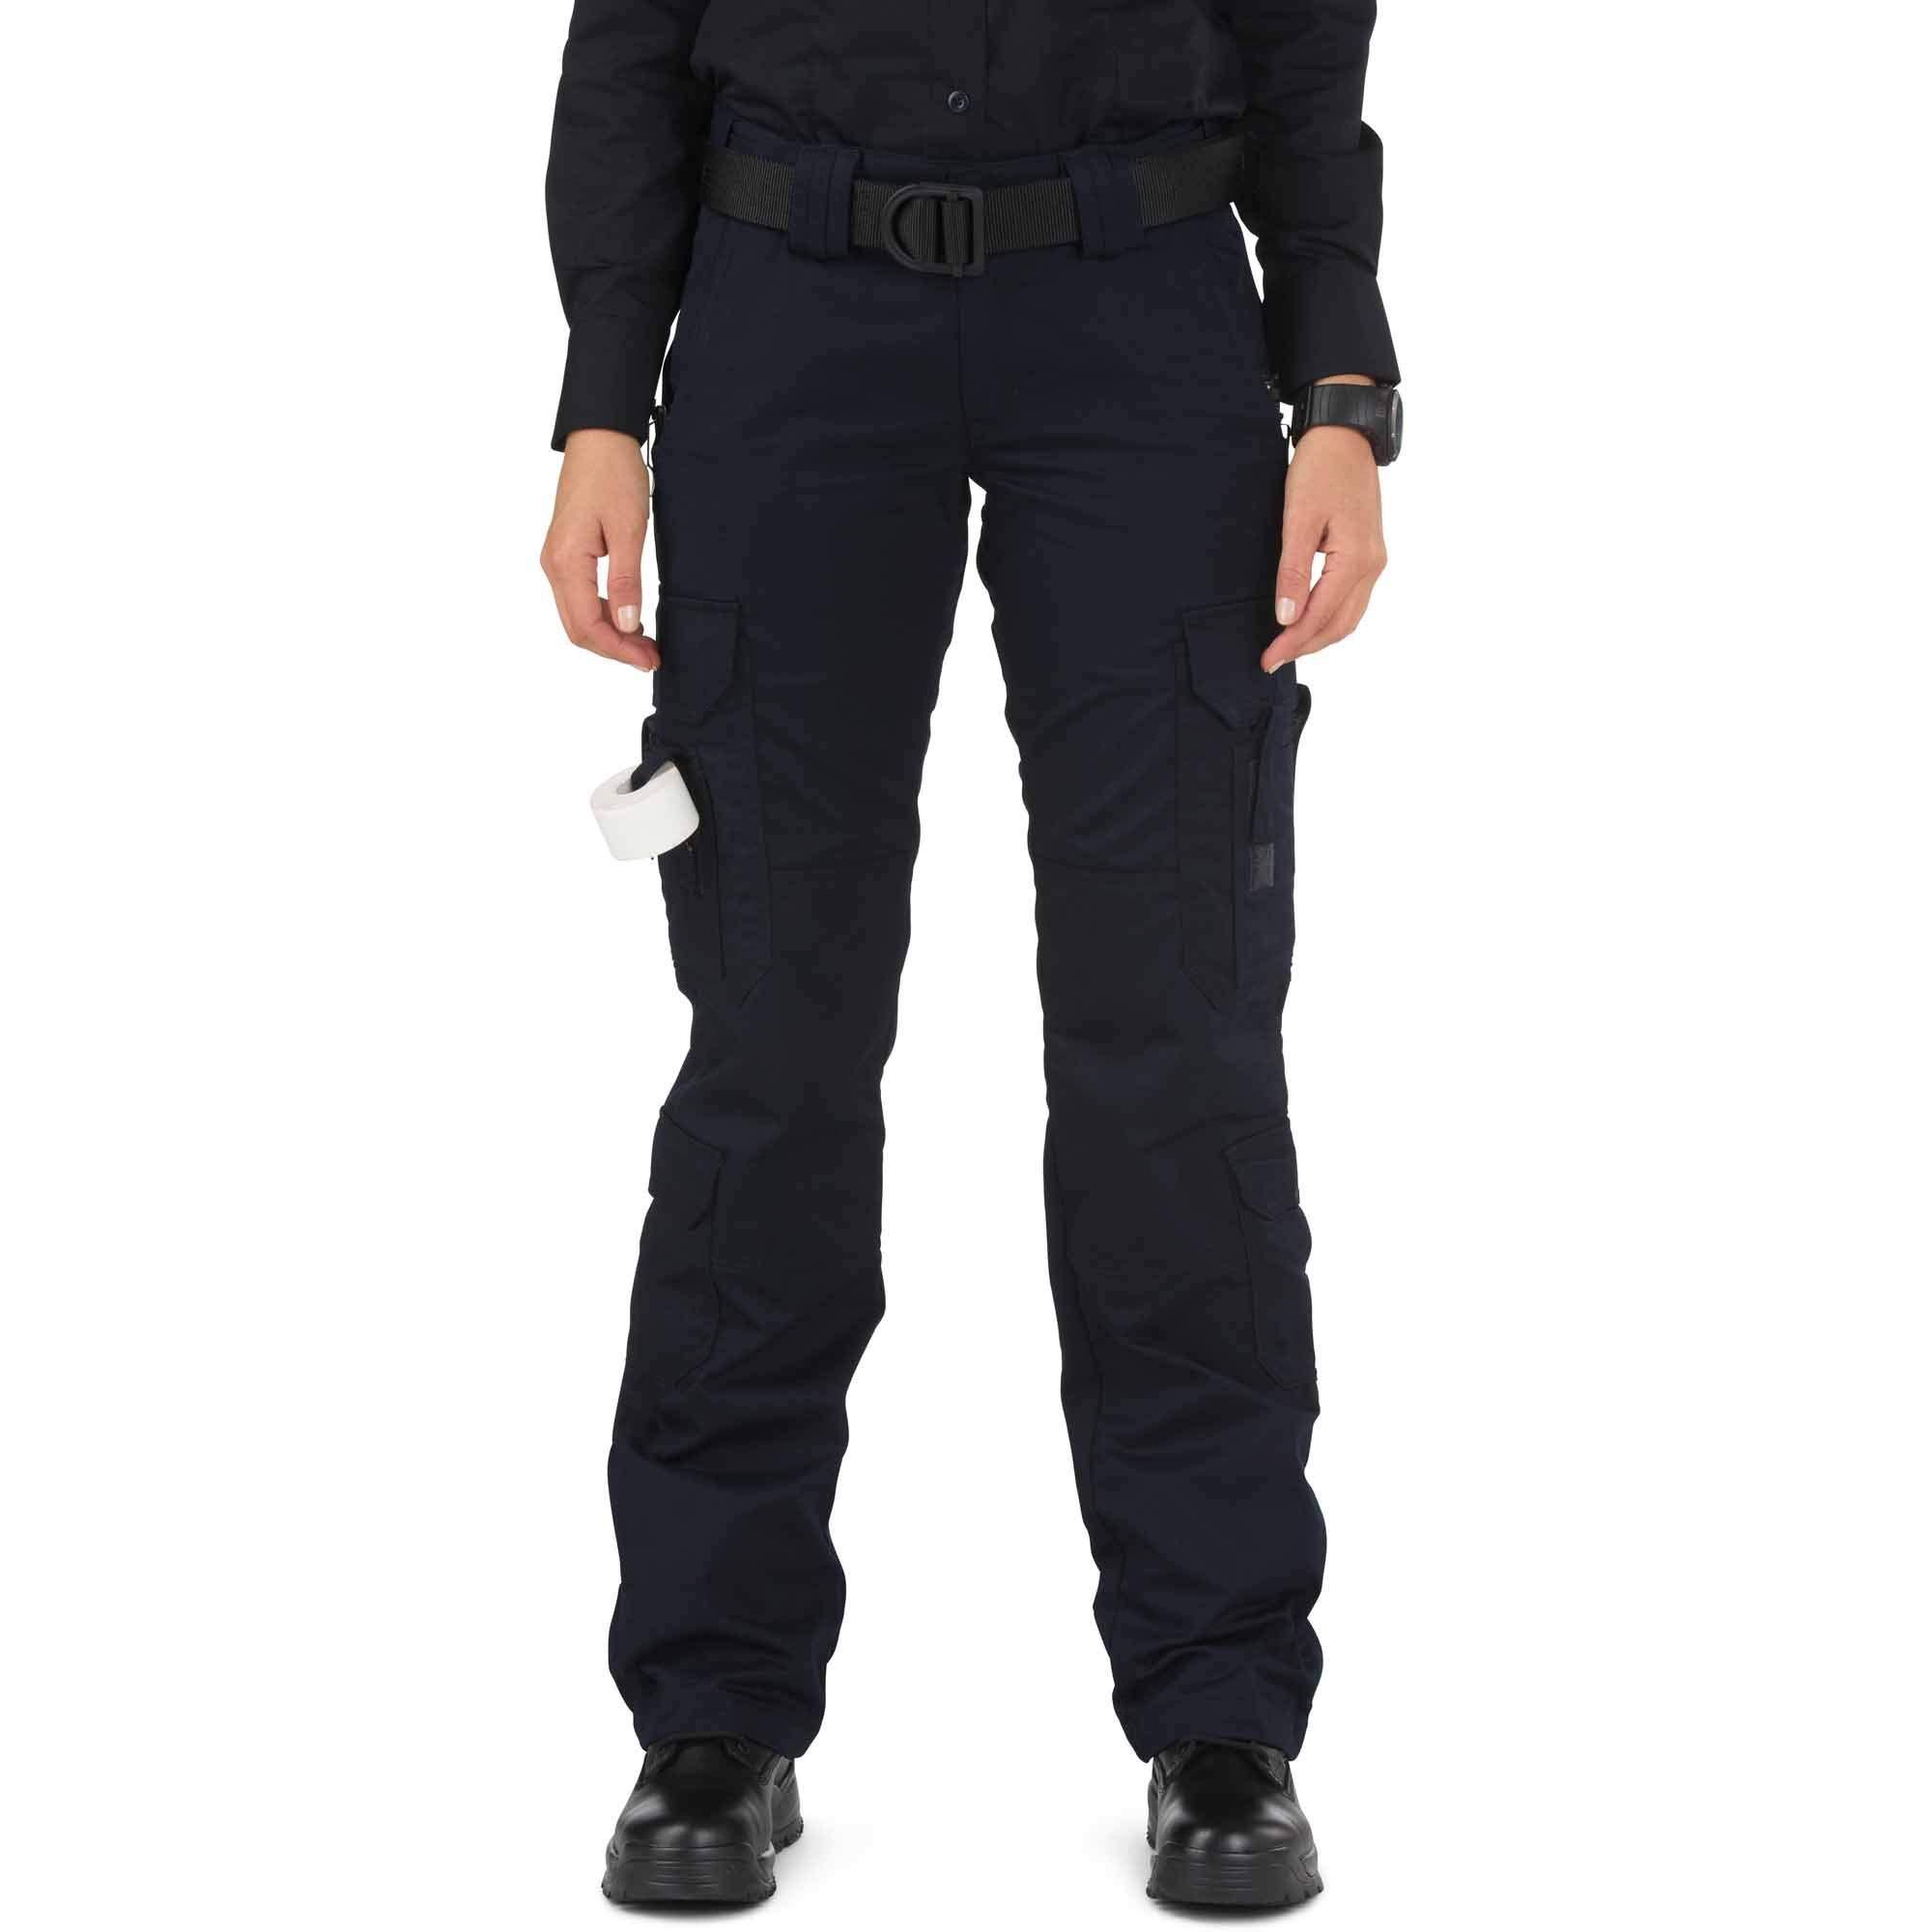 5.11 Tactical Women's Taclite EMS Pants Dark Navy 8/Long